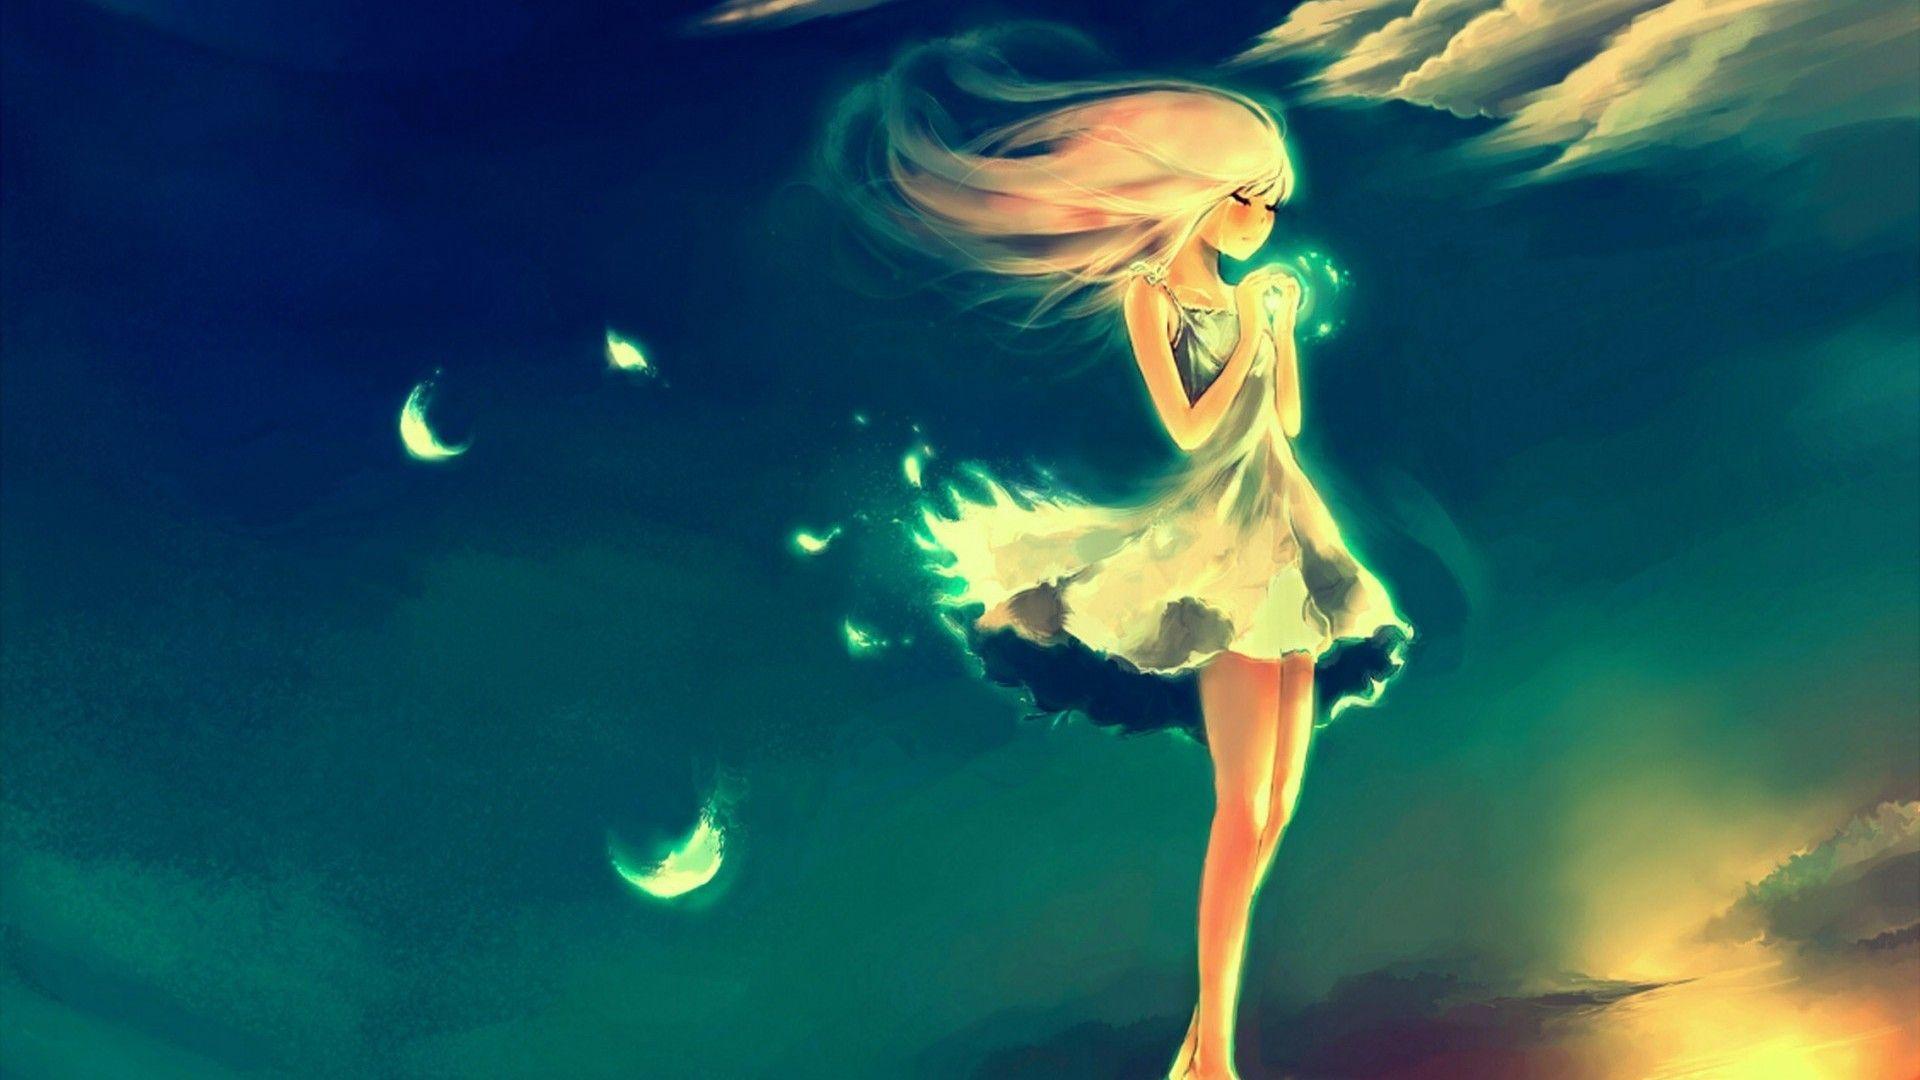 Alone Sad Anime Wallpapers - Top Free Alone Sad Anime ...